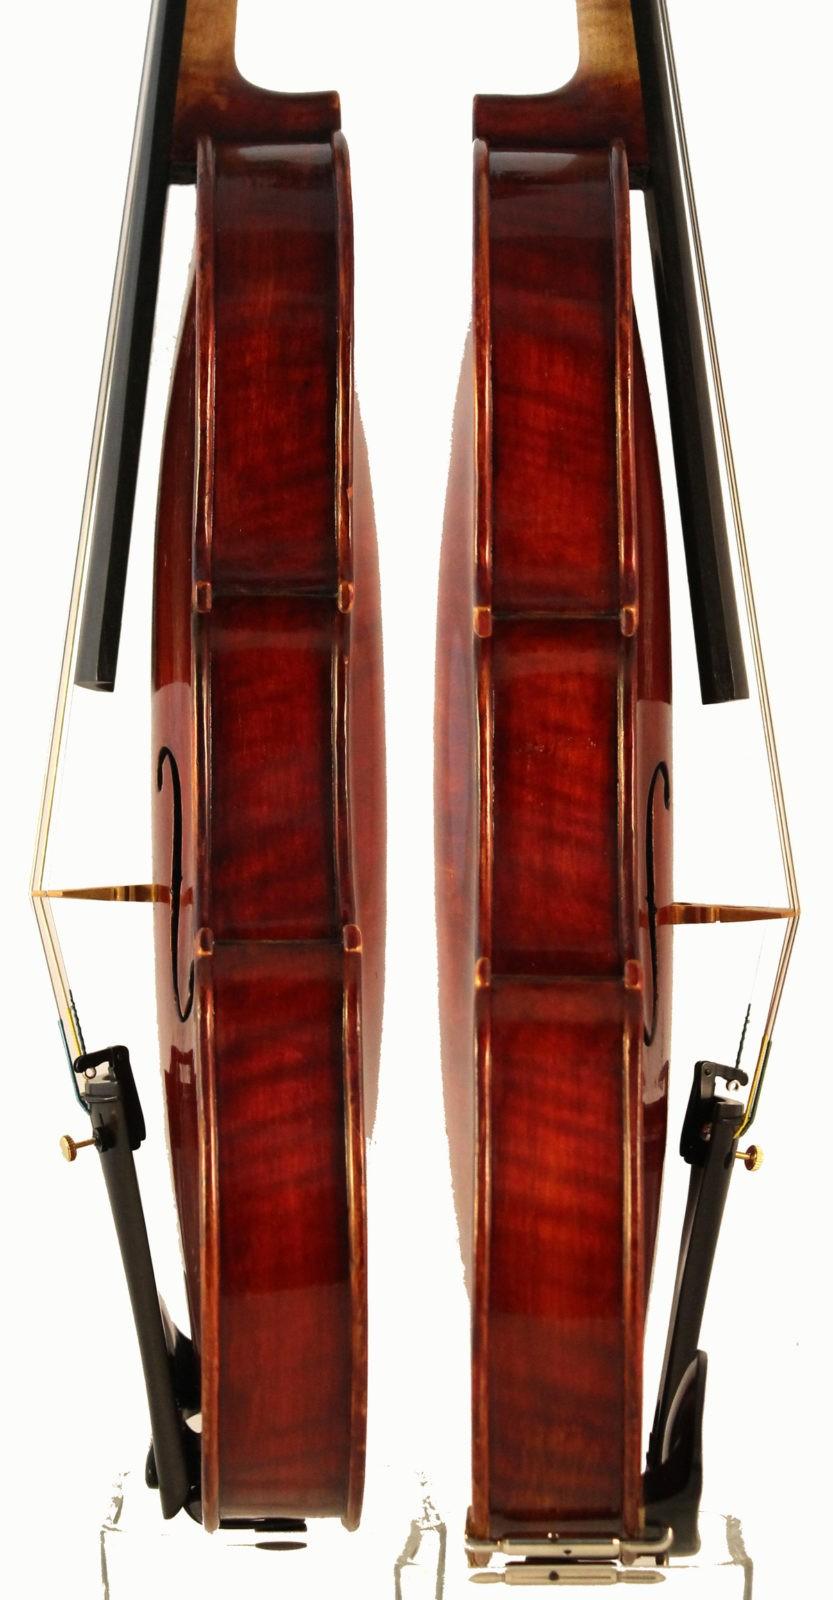 amati mangenot violin sides